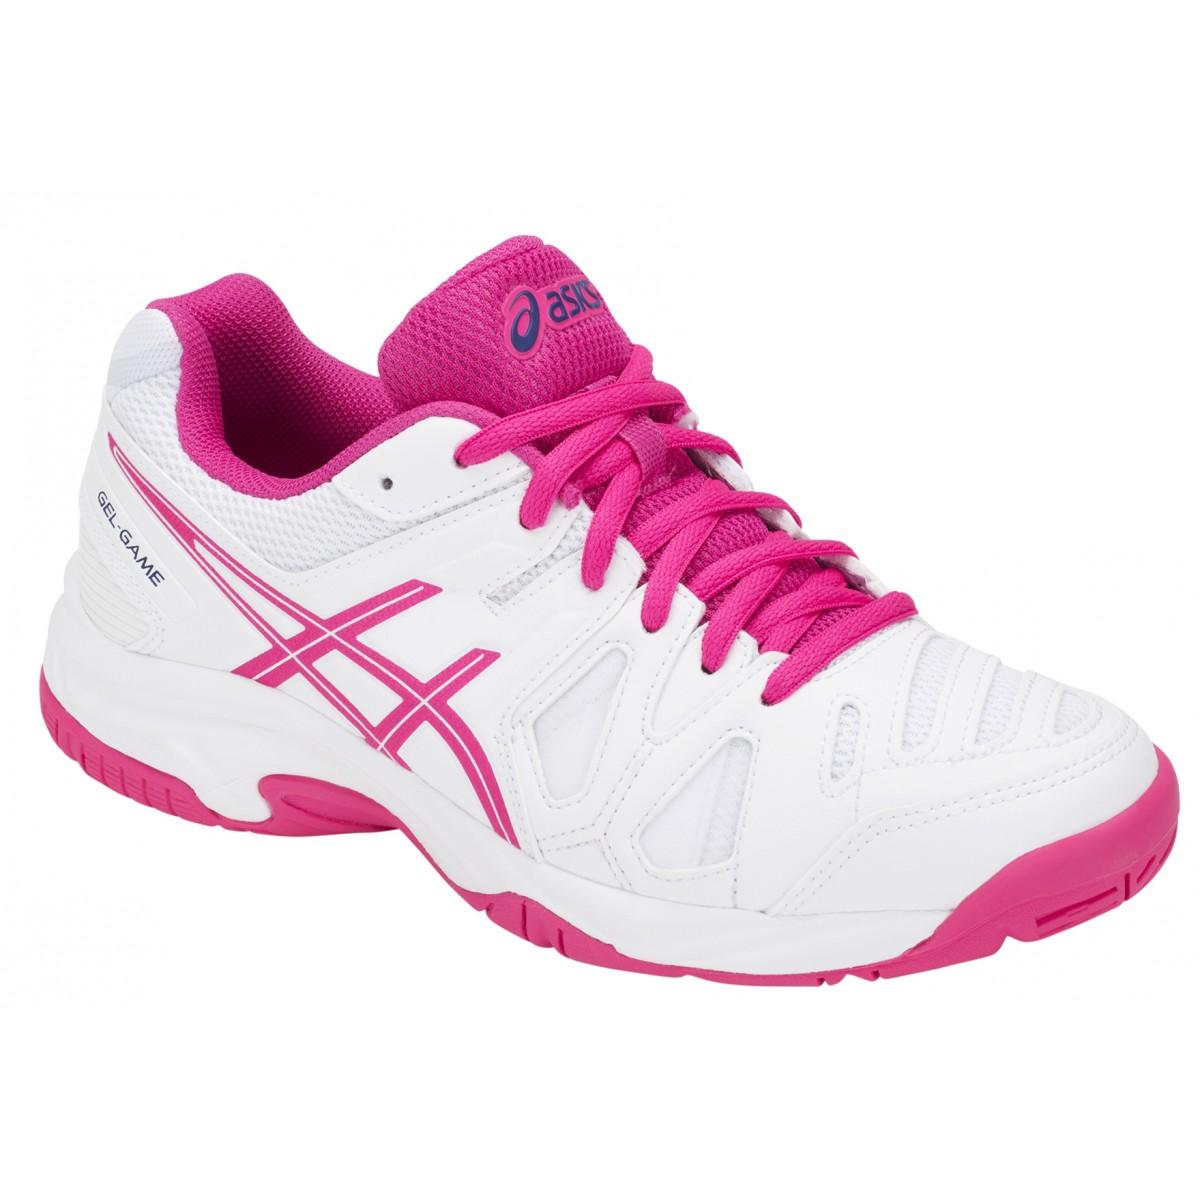 Chaussures Toutes Tennispro 5 Gel Game Junior Asics Gs Surfaces PnPBaR